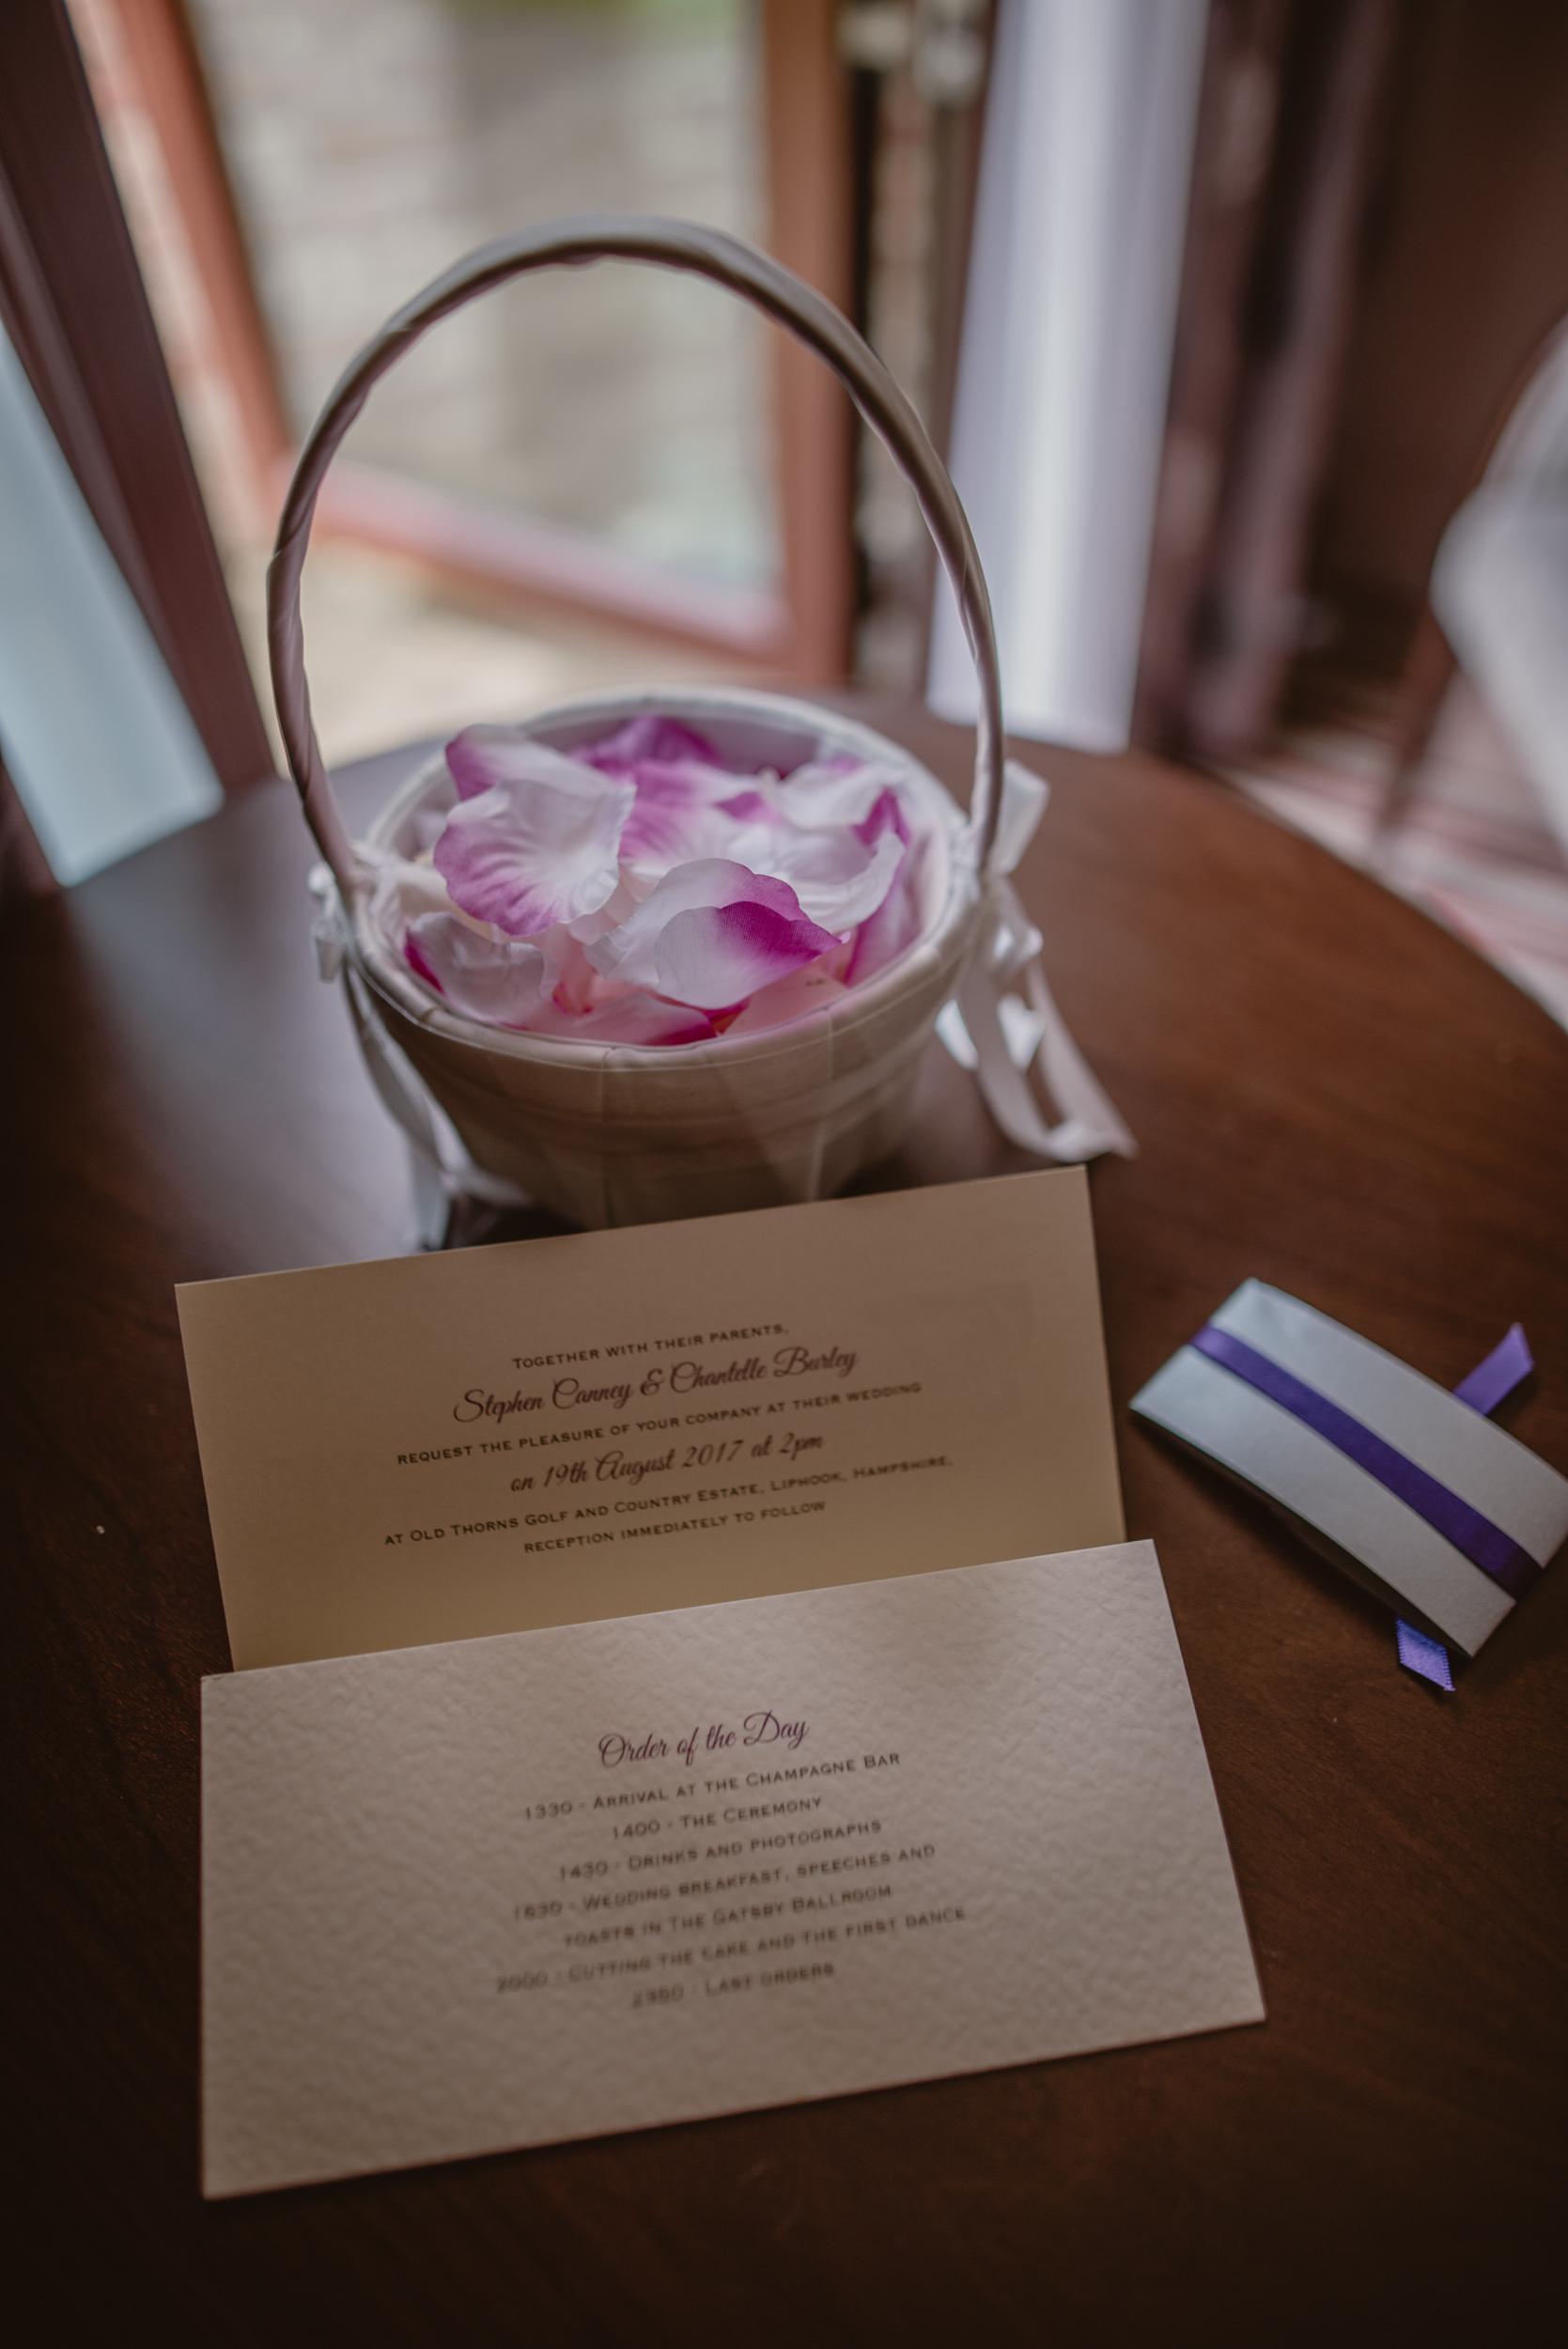 Chantelle-and-Stephen-Old-Thorns-Hotel-Wedding-Liphook-Manu-Mendoza-Wedding-Photography-095.jpg